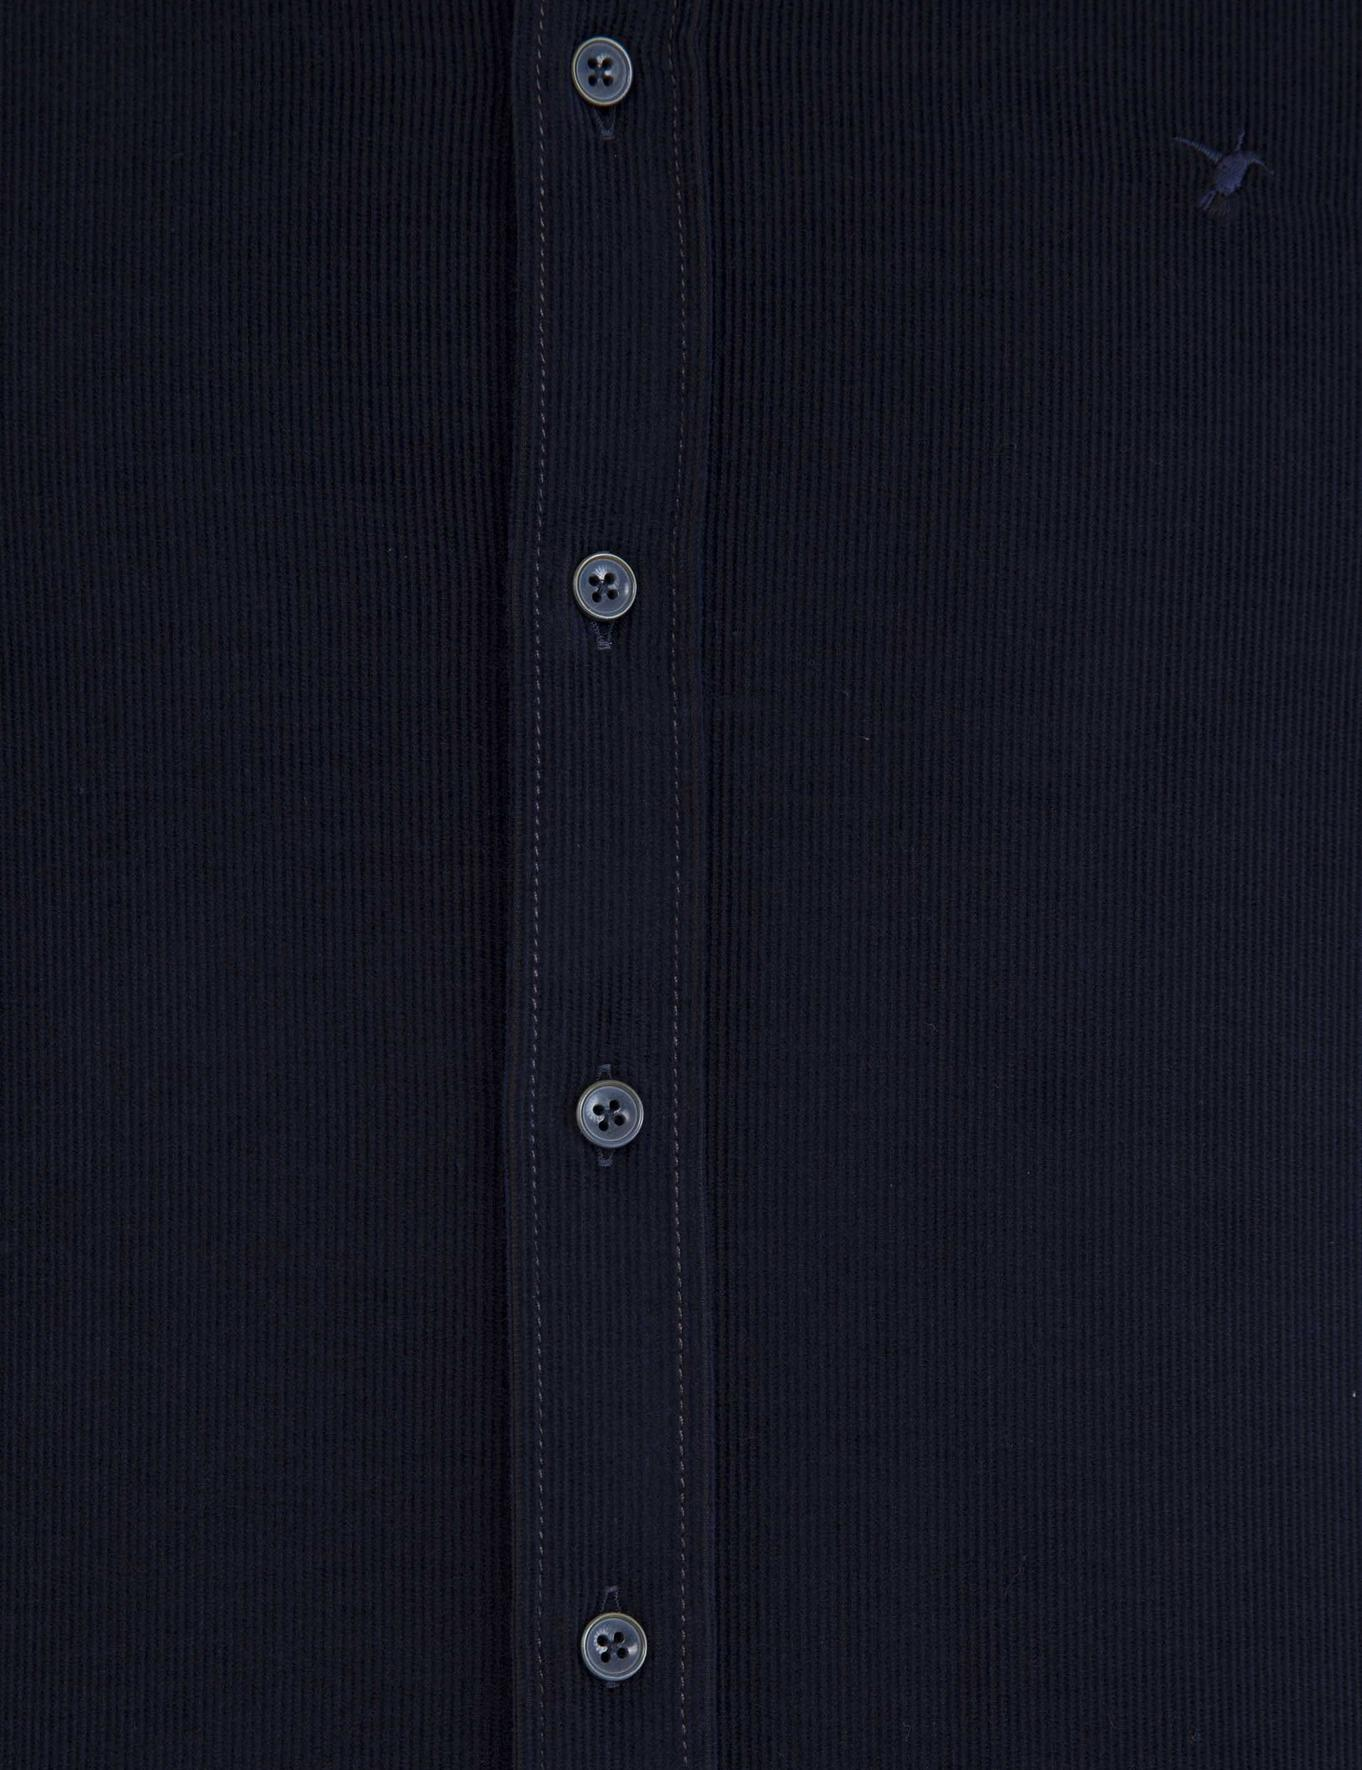 Lacivert Slim Fit Gömlek - 50227351029